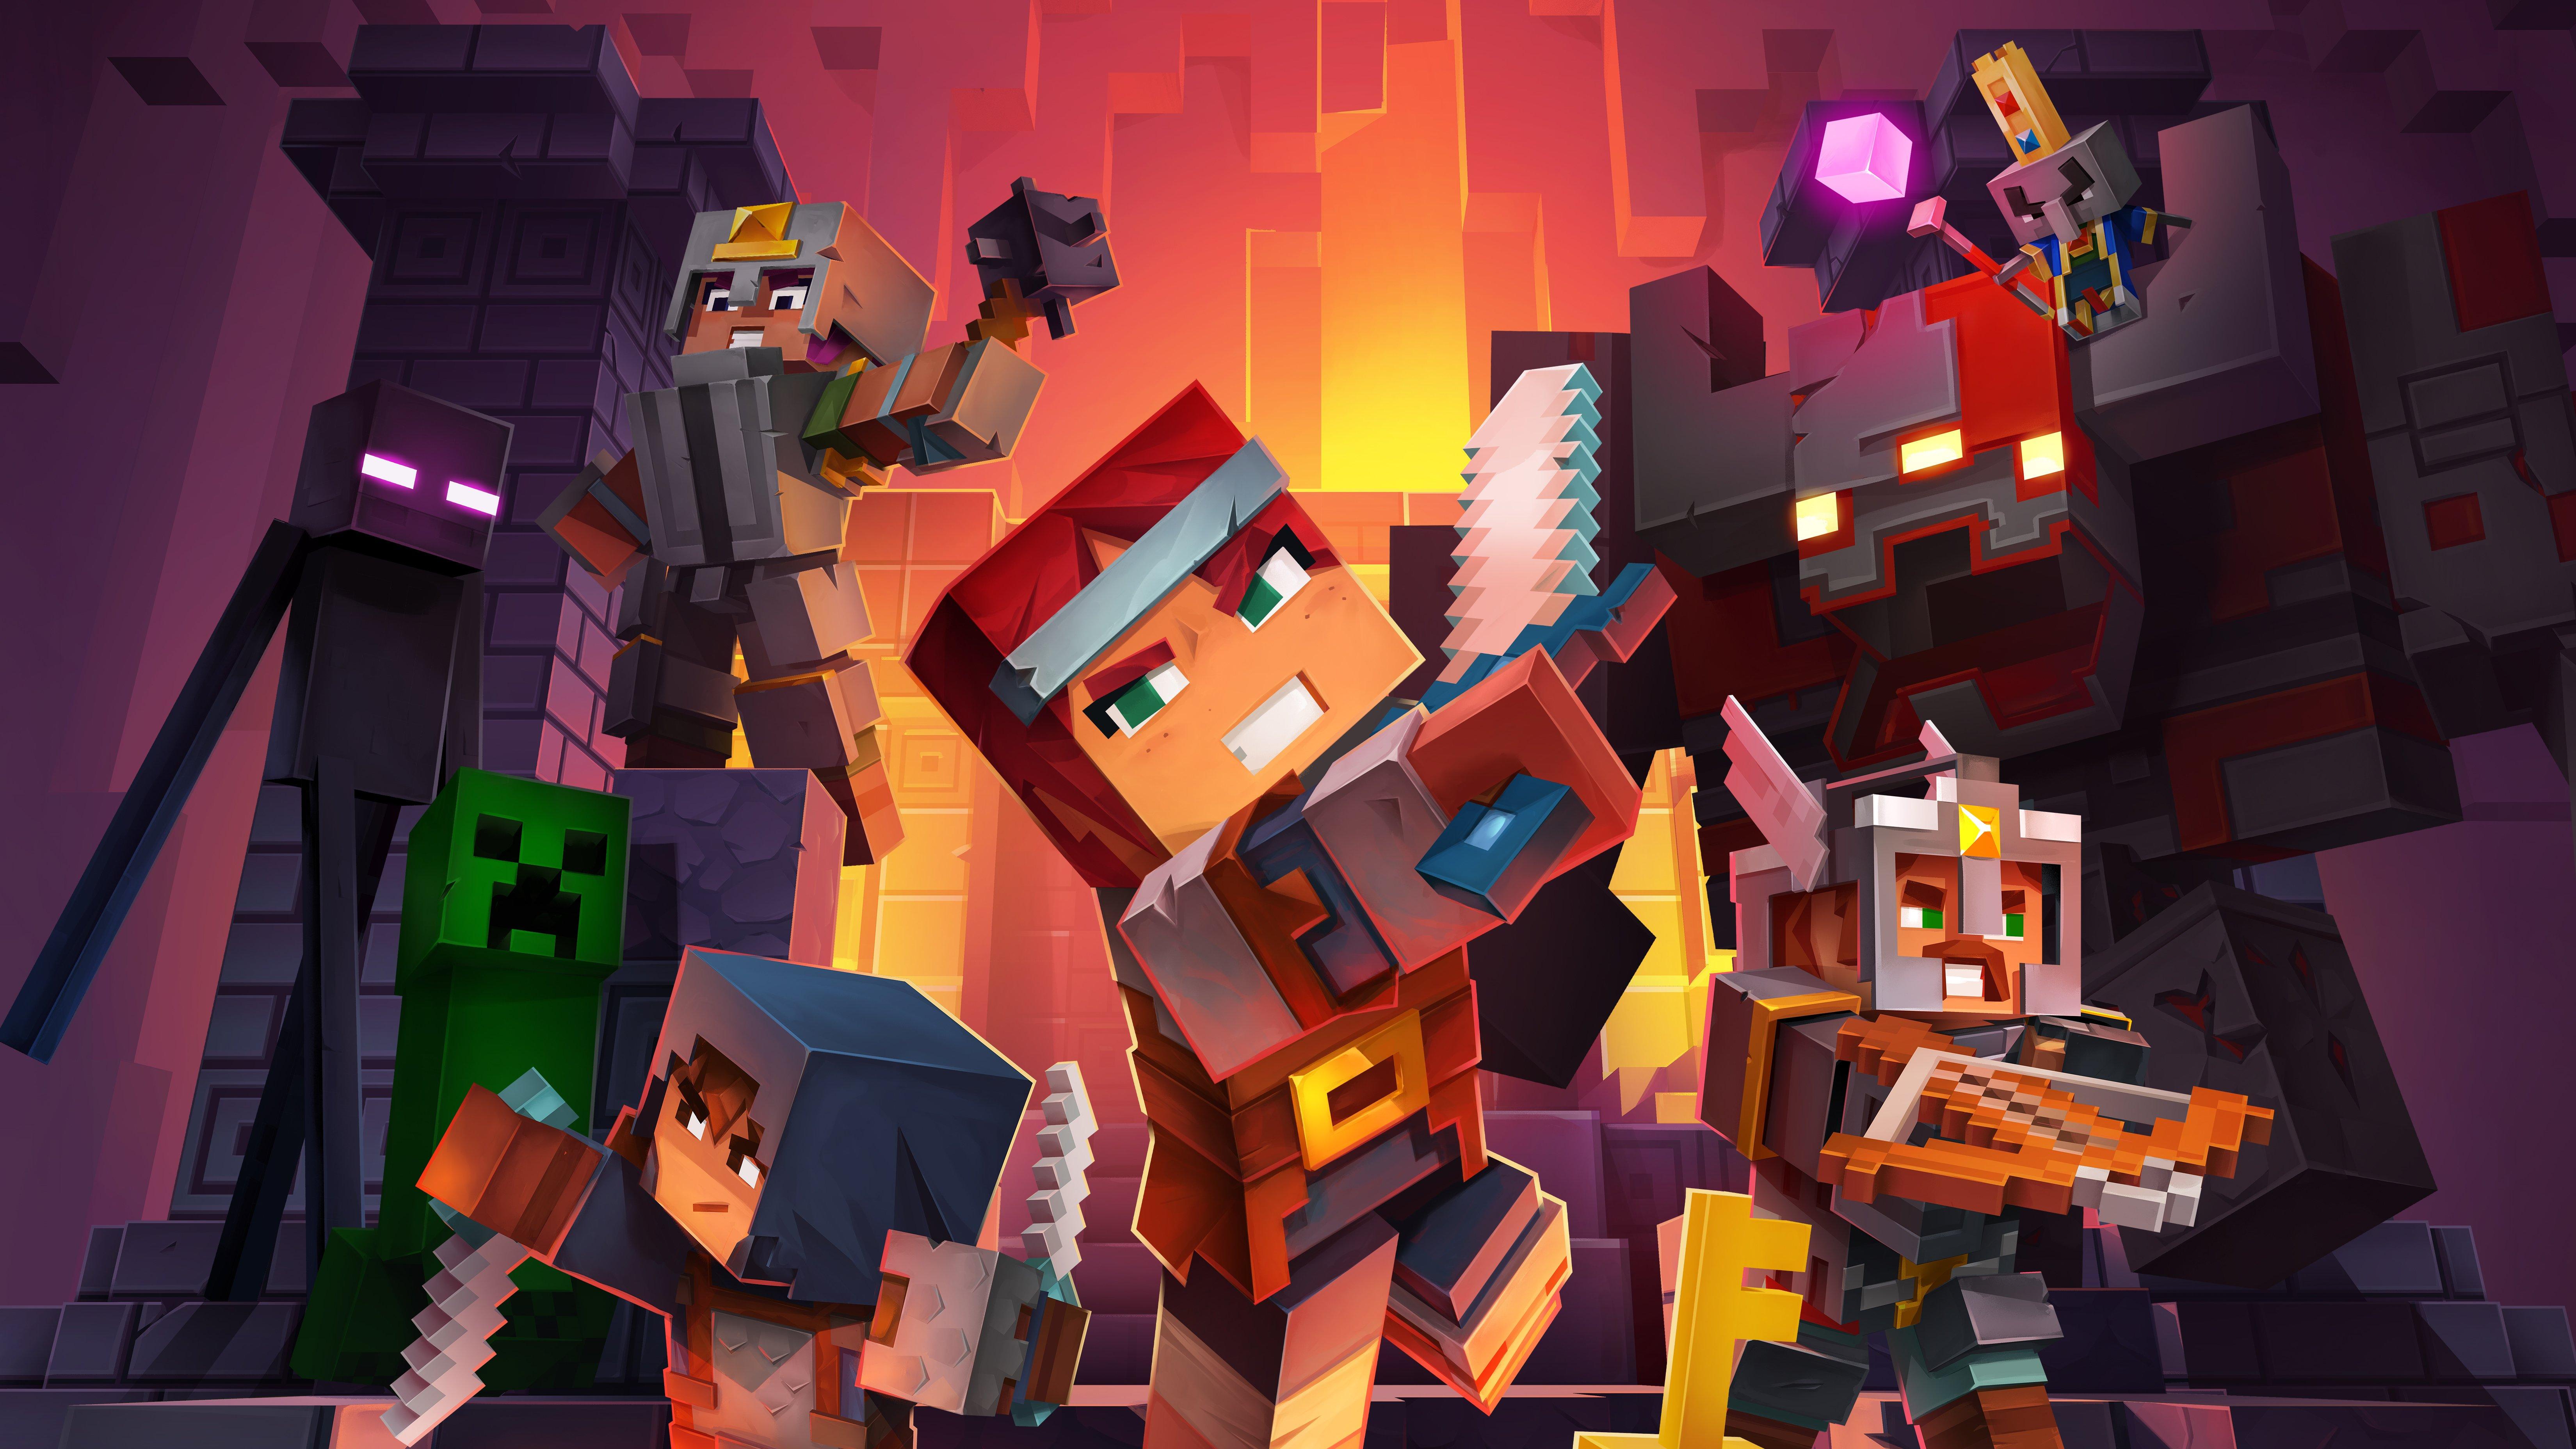 Fondos de pantalla Personajes de Minecraft Dungeons